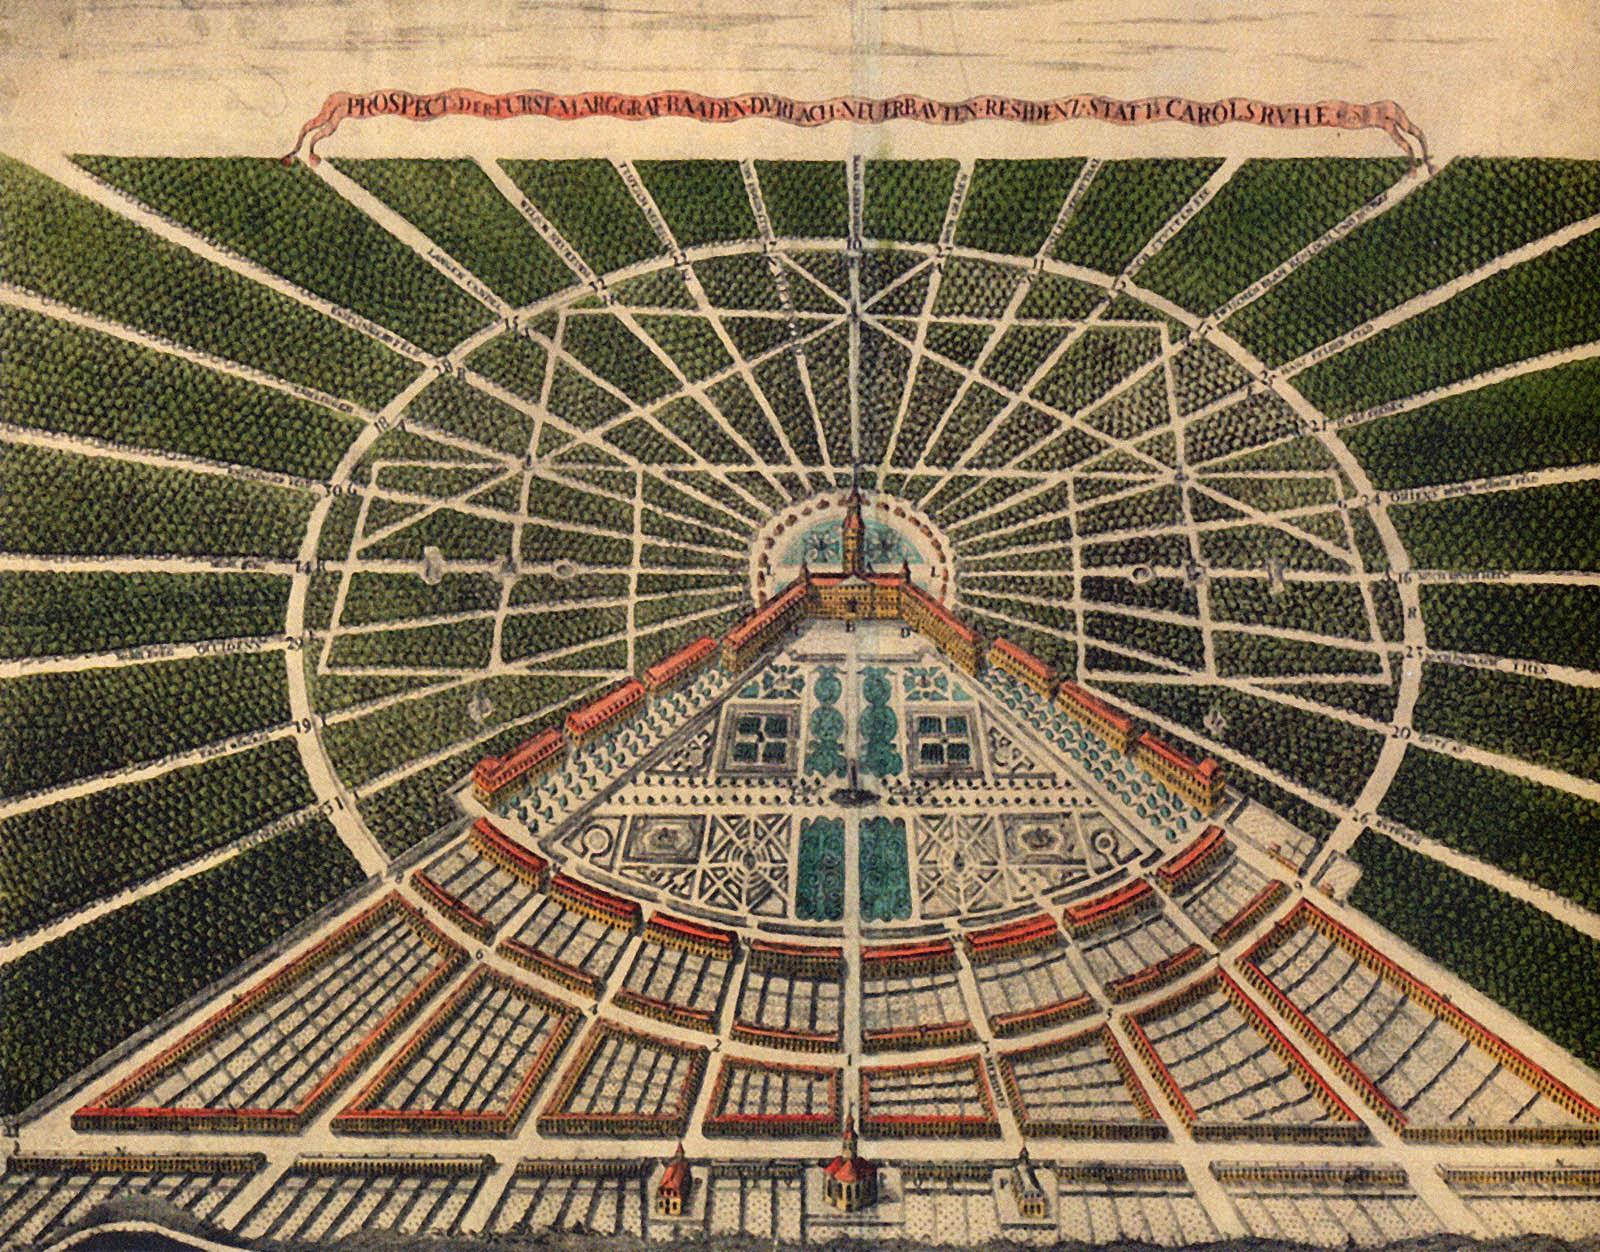 foto del plano de Karlsruhe